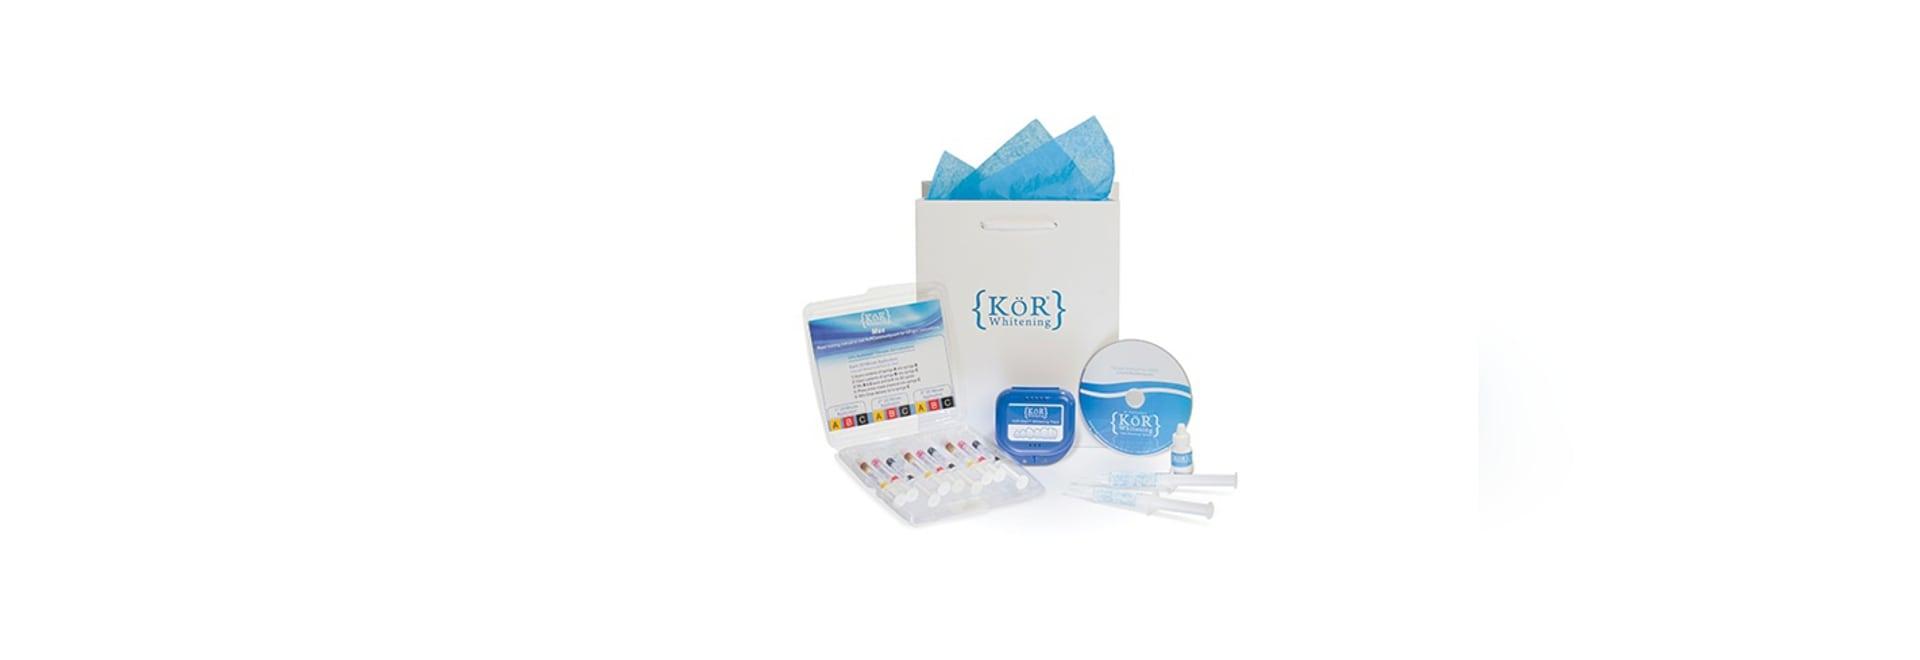 k ouml r whitening whitening system offers cost effective solutions koumlr whitening whitening system offers cost effective solutions